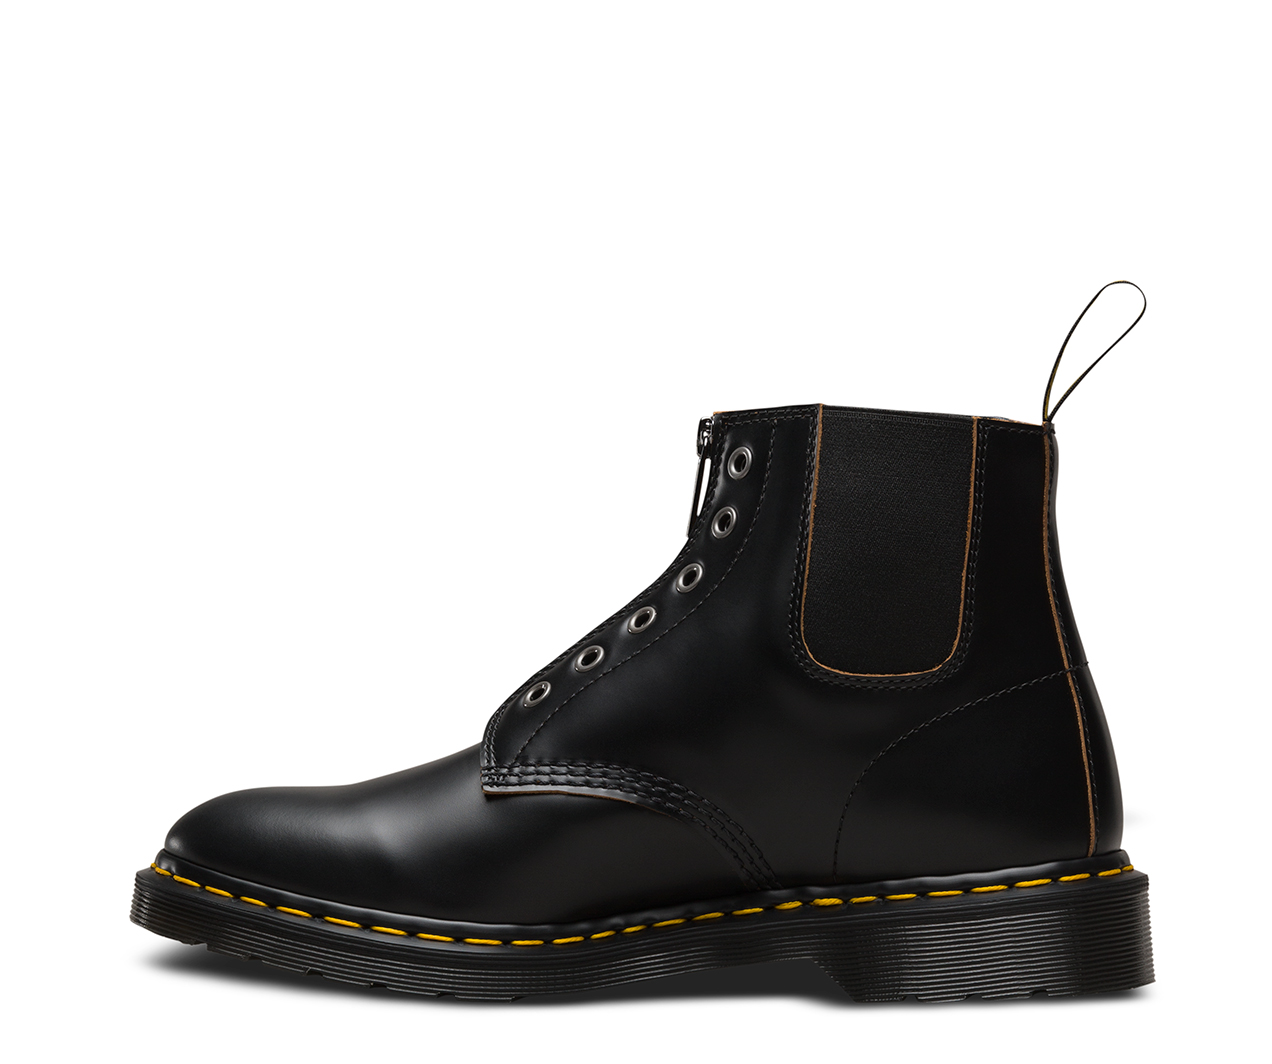 Black 101 GST Boots Dr. Martens 7G4iPV5